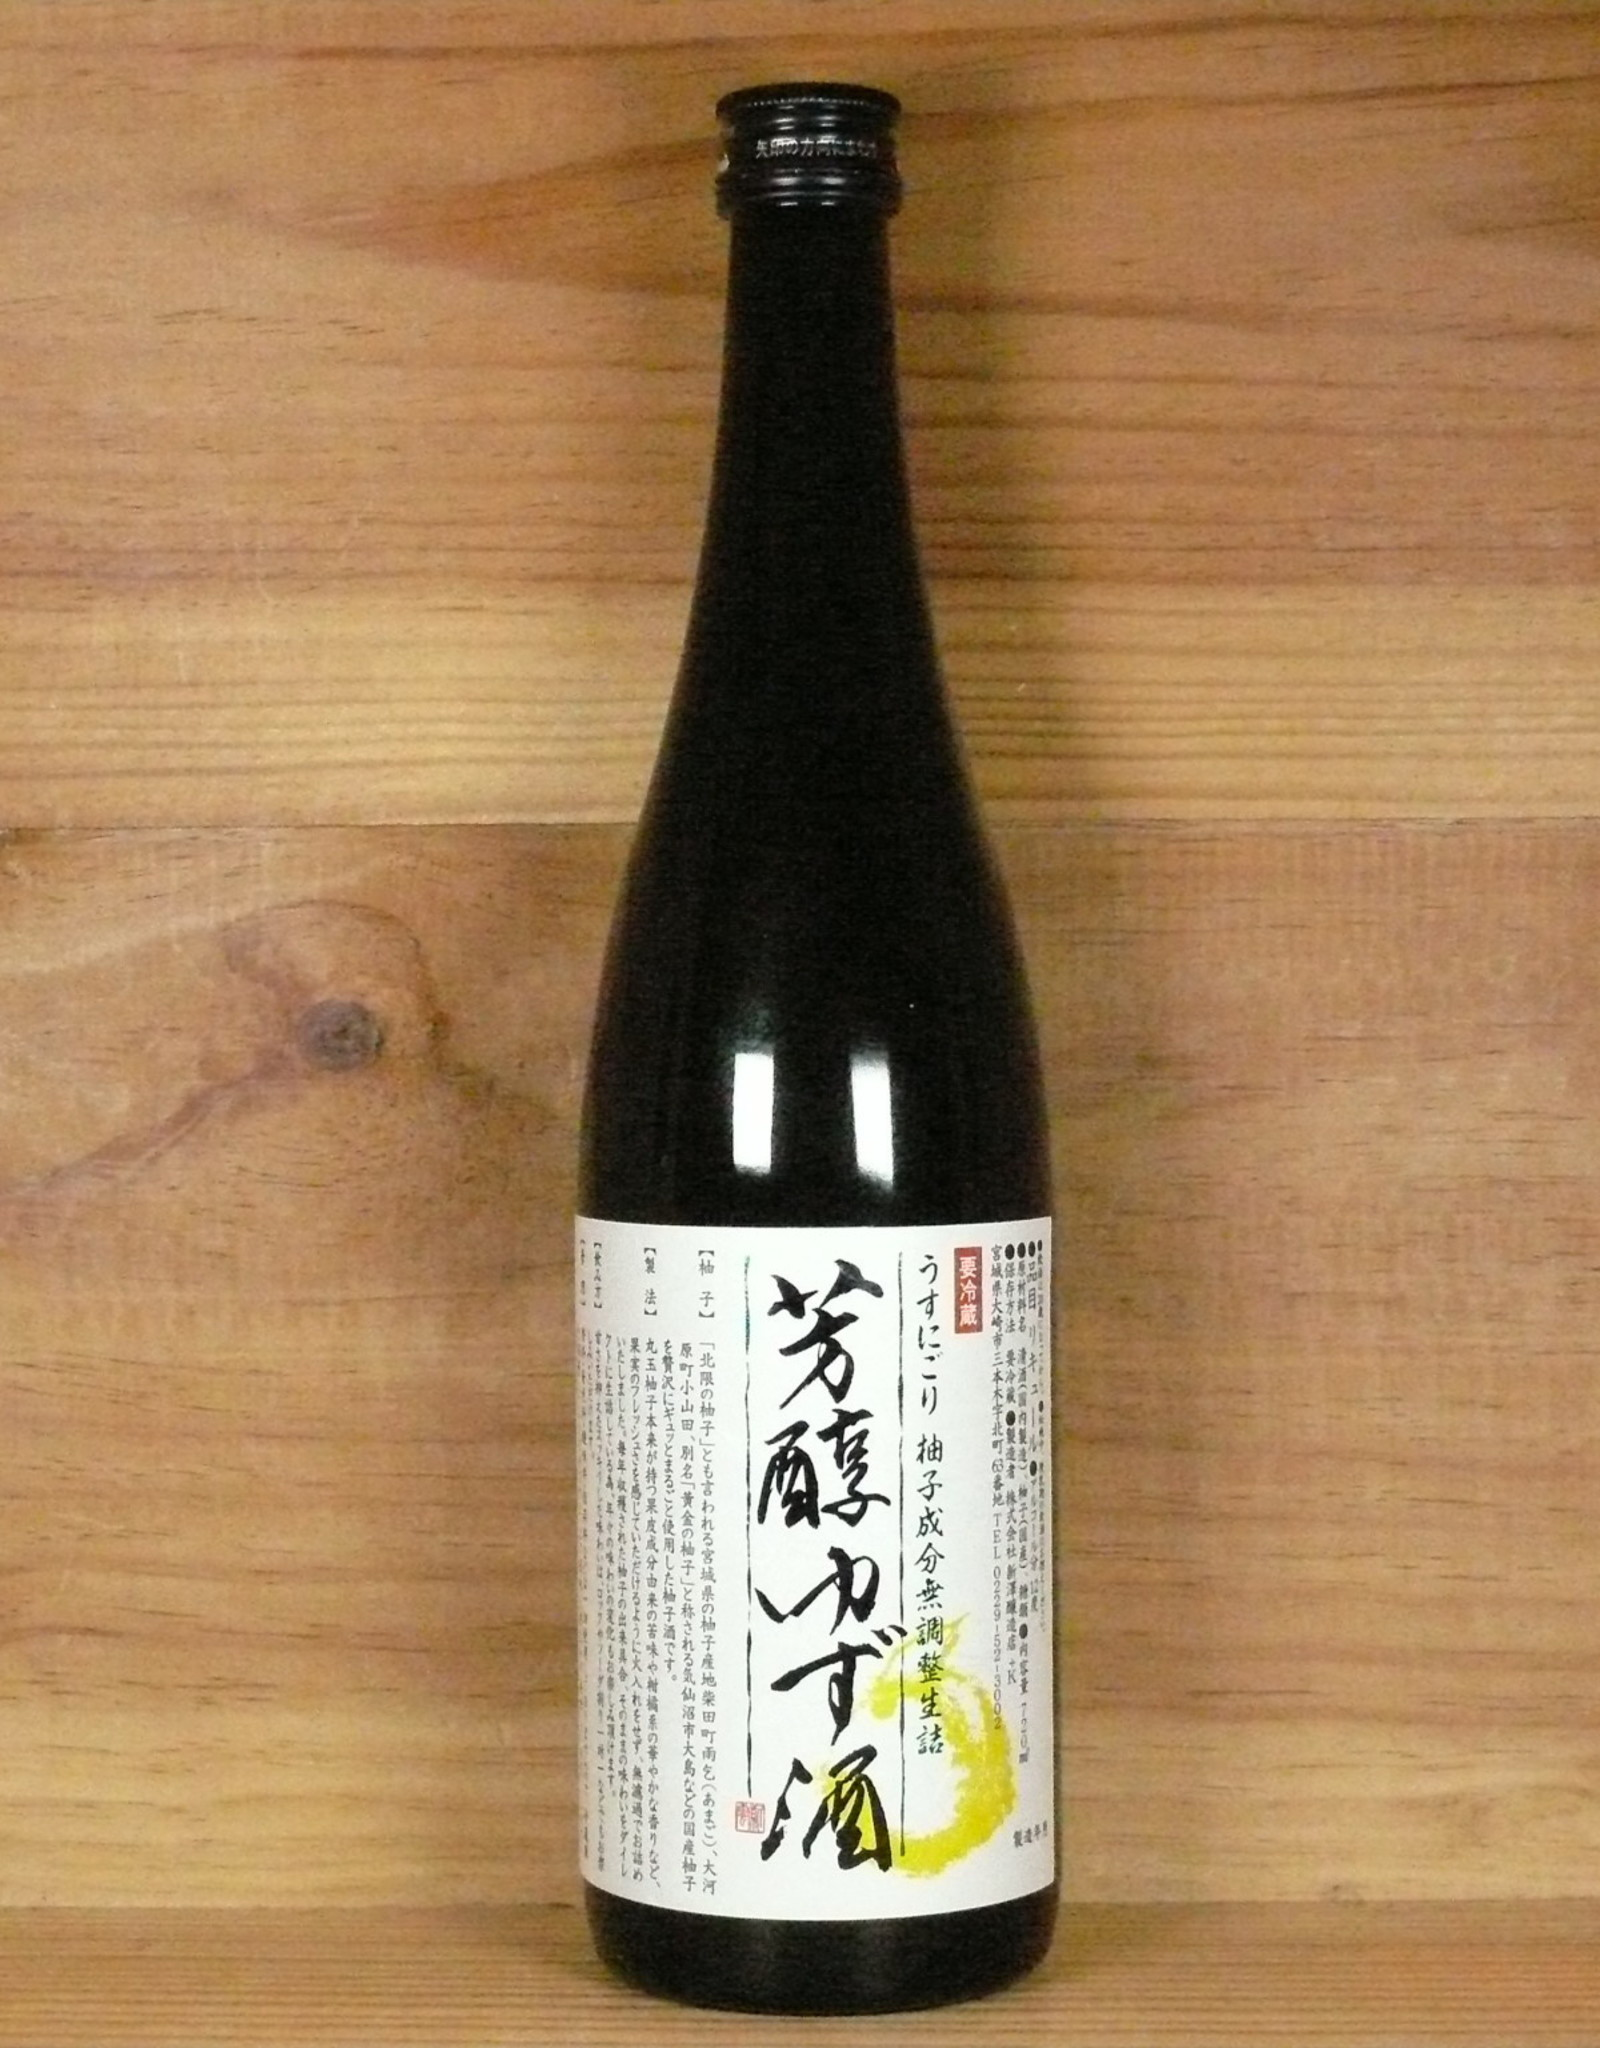 Niizawa Brewery - Hojun Yuzu Sake